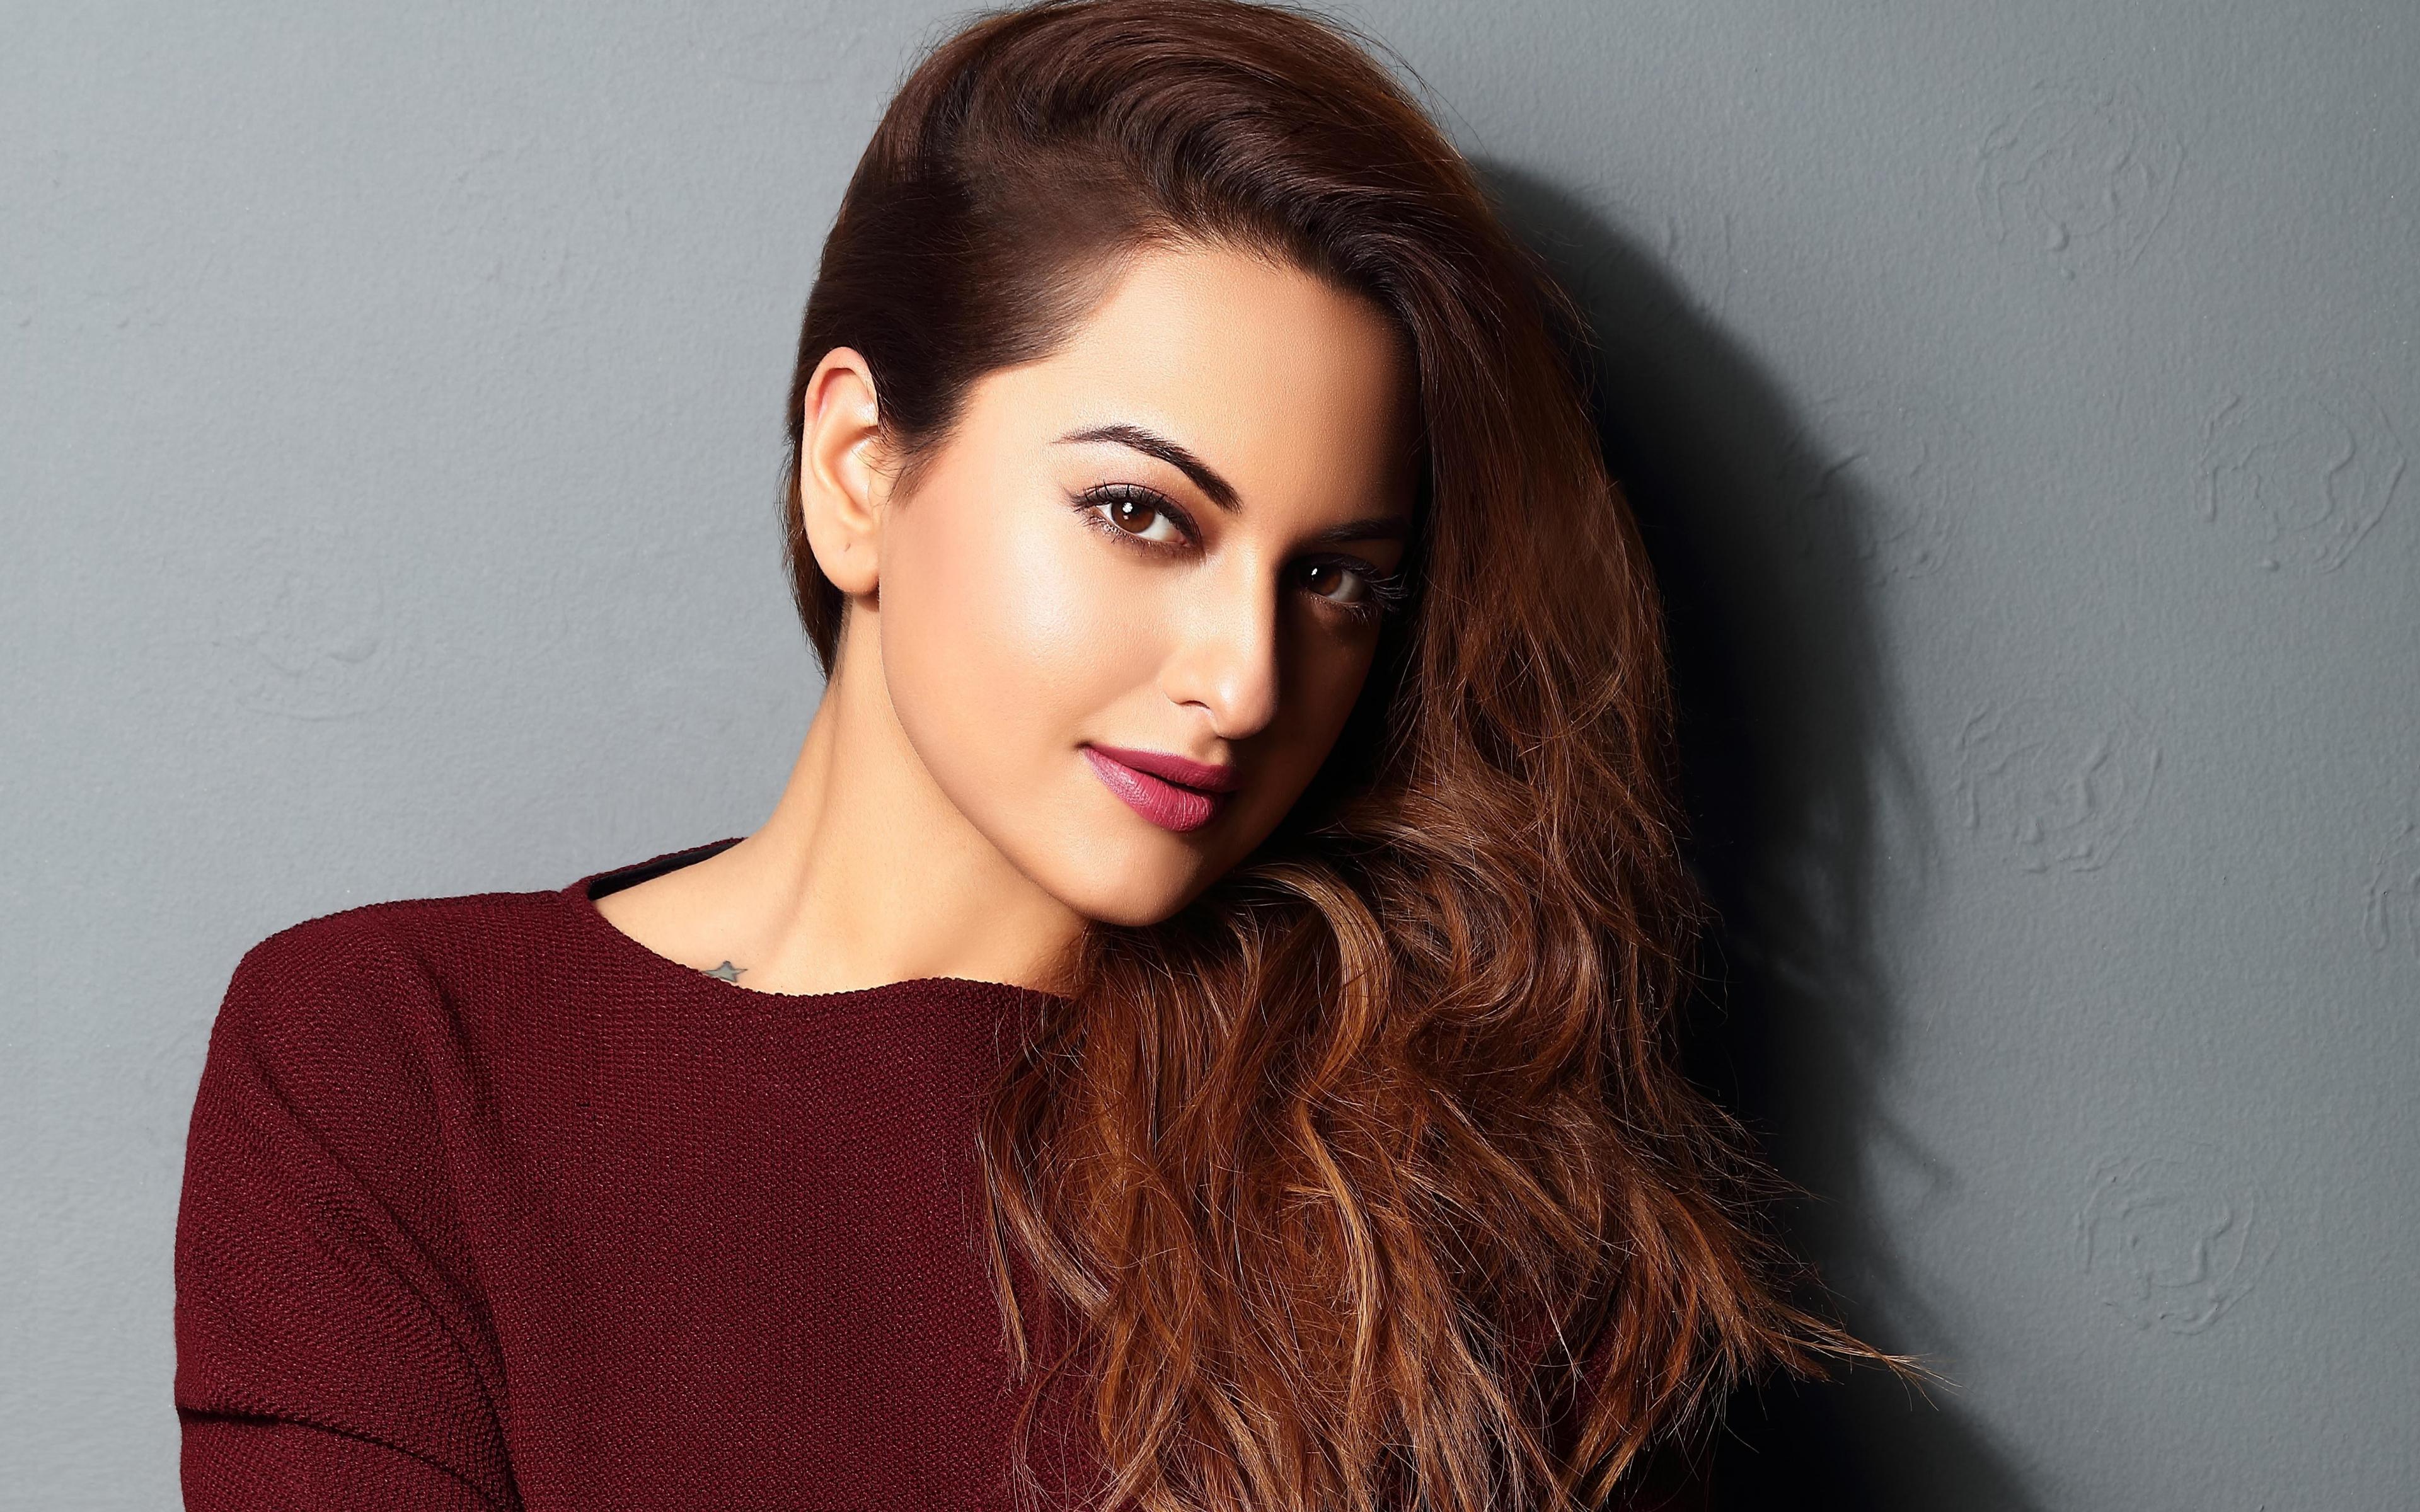 Download 3840x2400 Wallpaper Sonakshi Sinha Bollywood Actress 4k